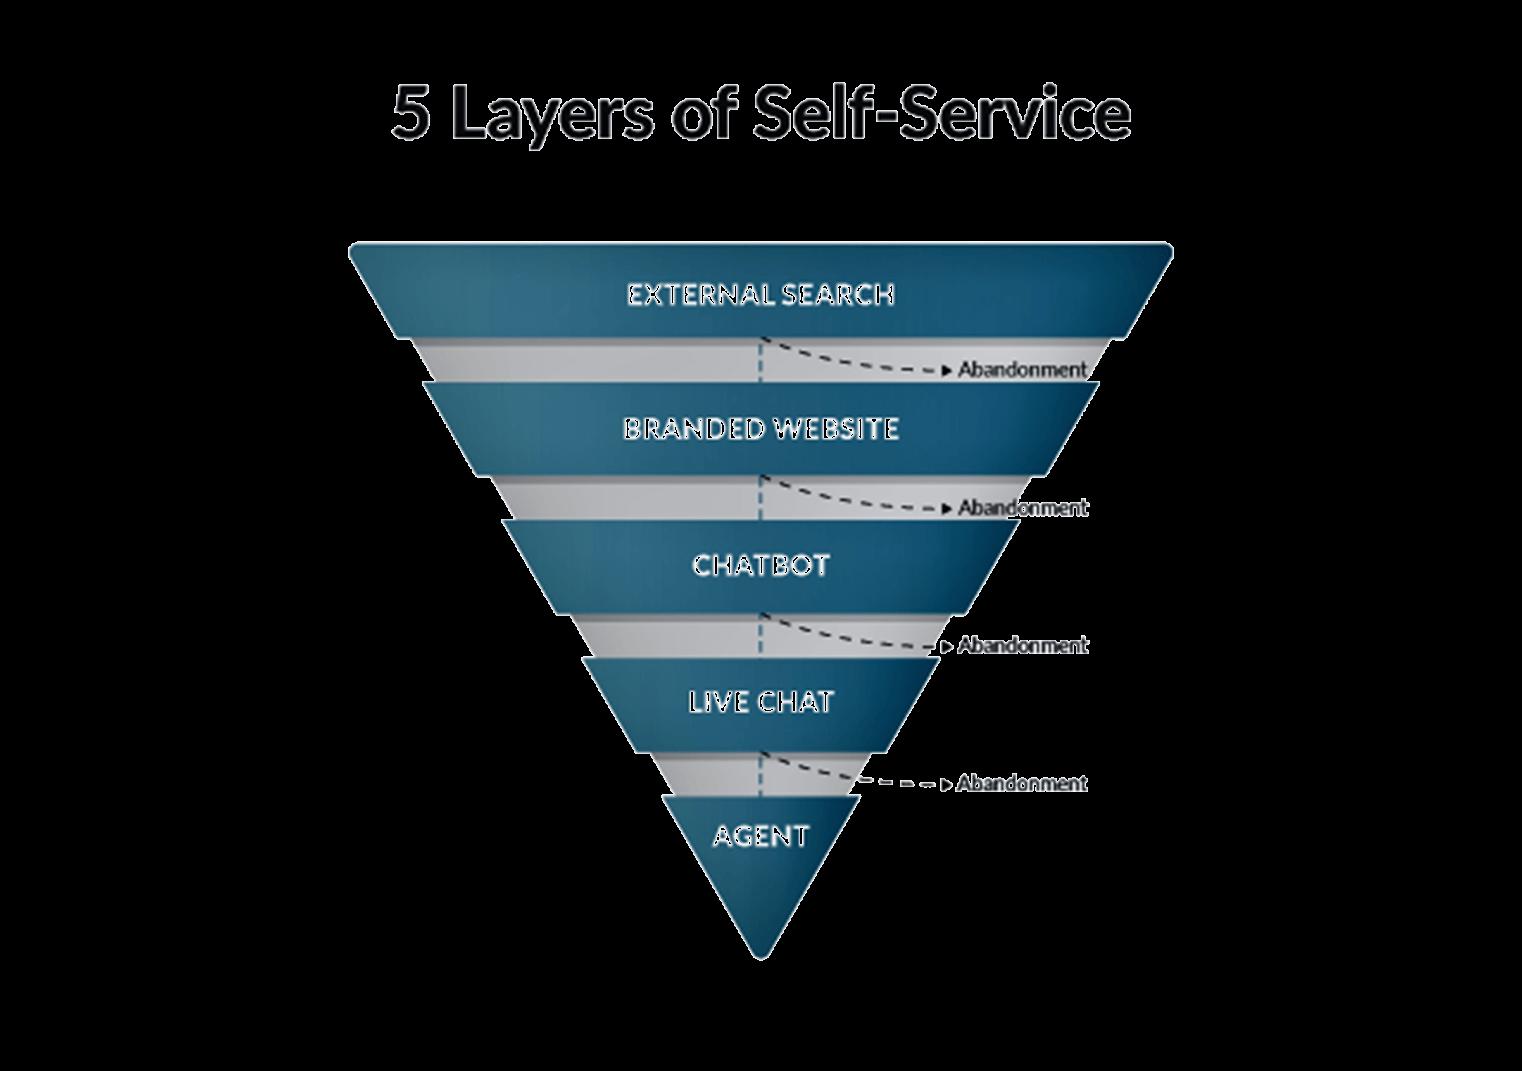 5 self-service layers